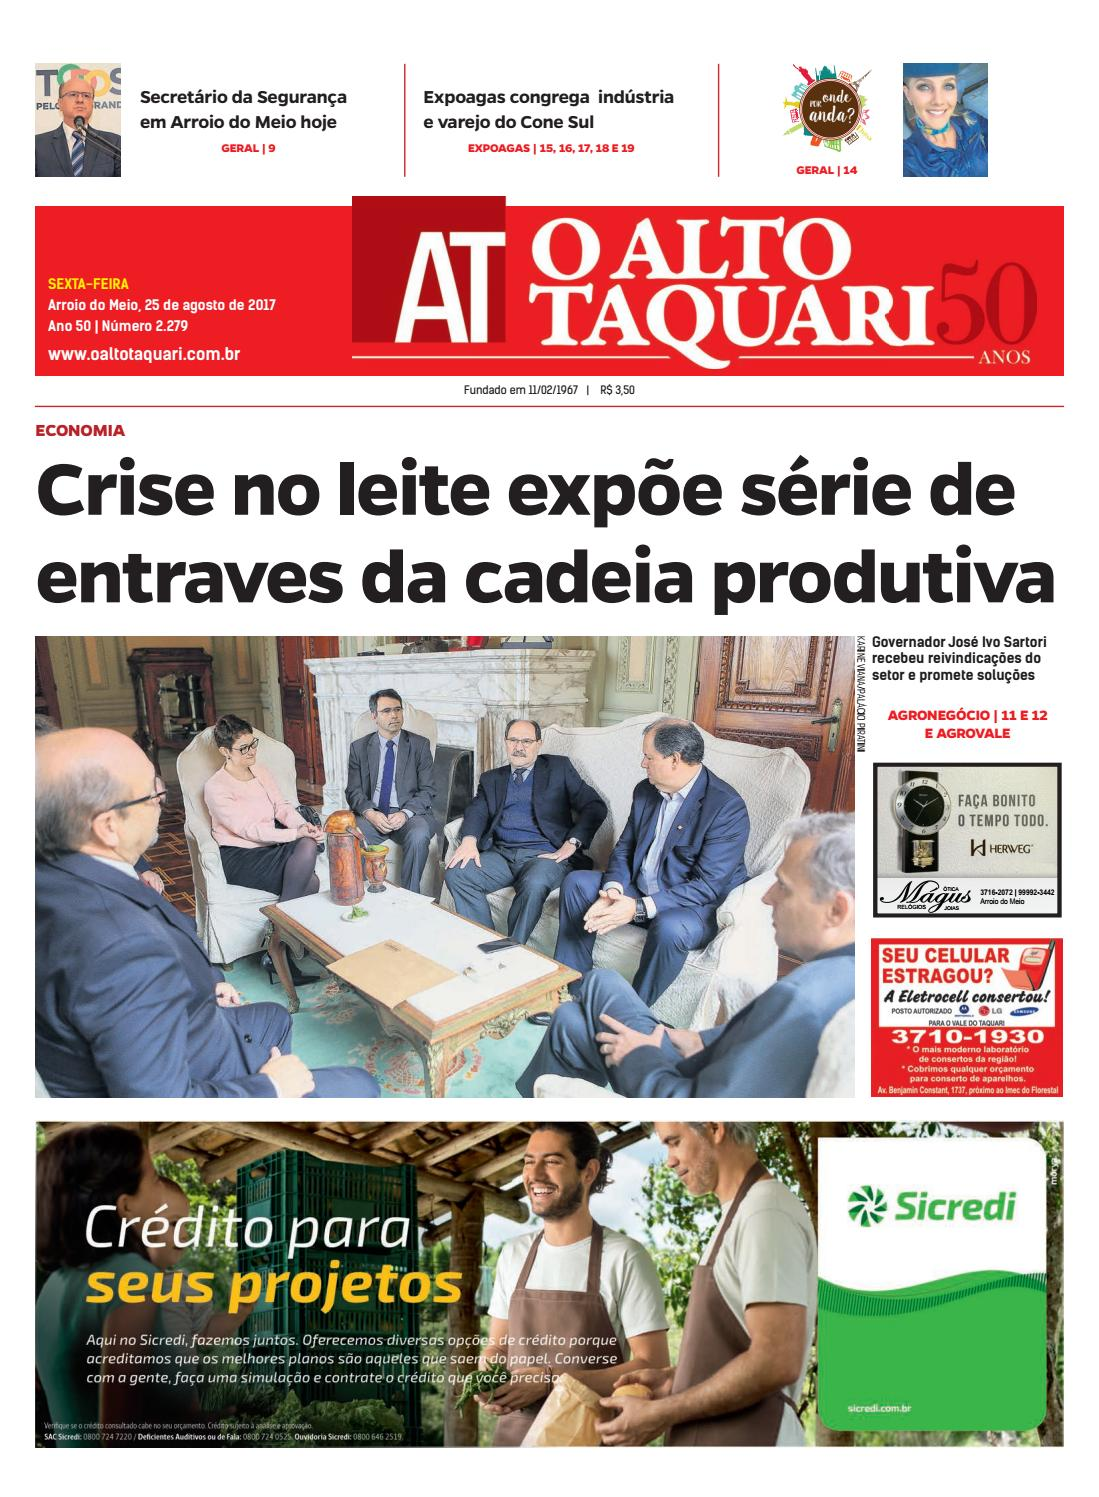 d8fa931ae Jornal O Alto Taquari - 25 de agosto de 2017 by Jornal O Alto Taquari -  issuu